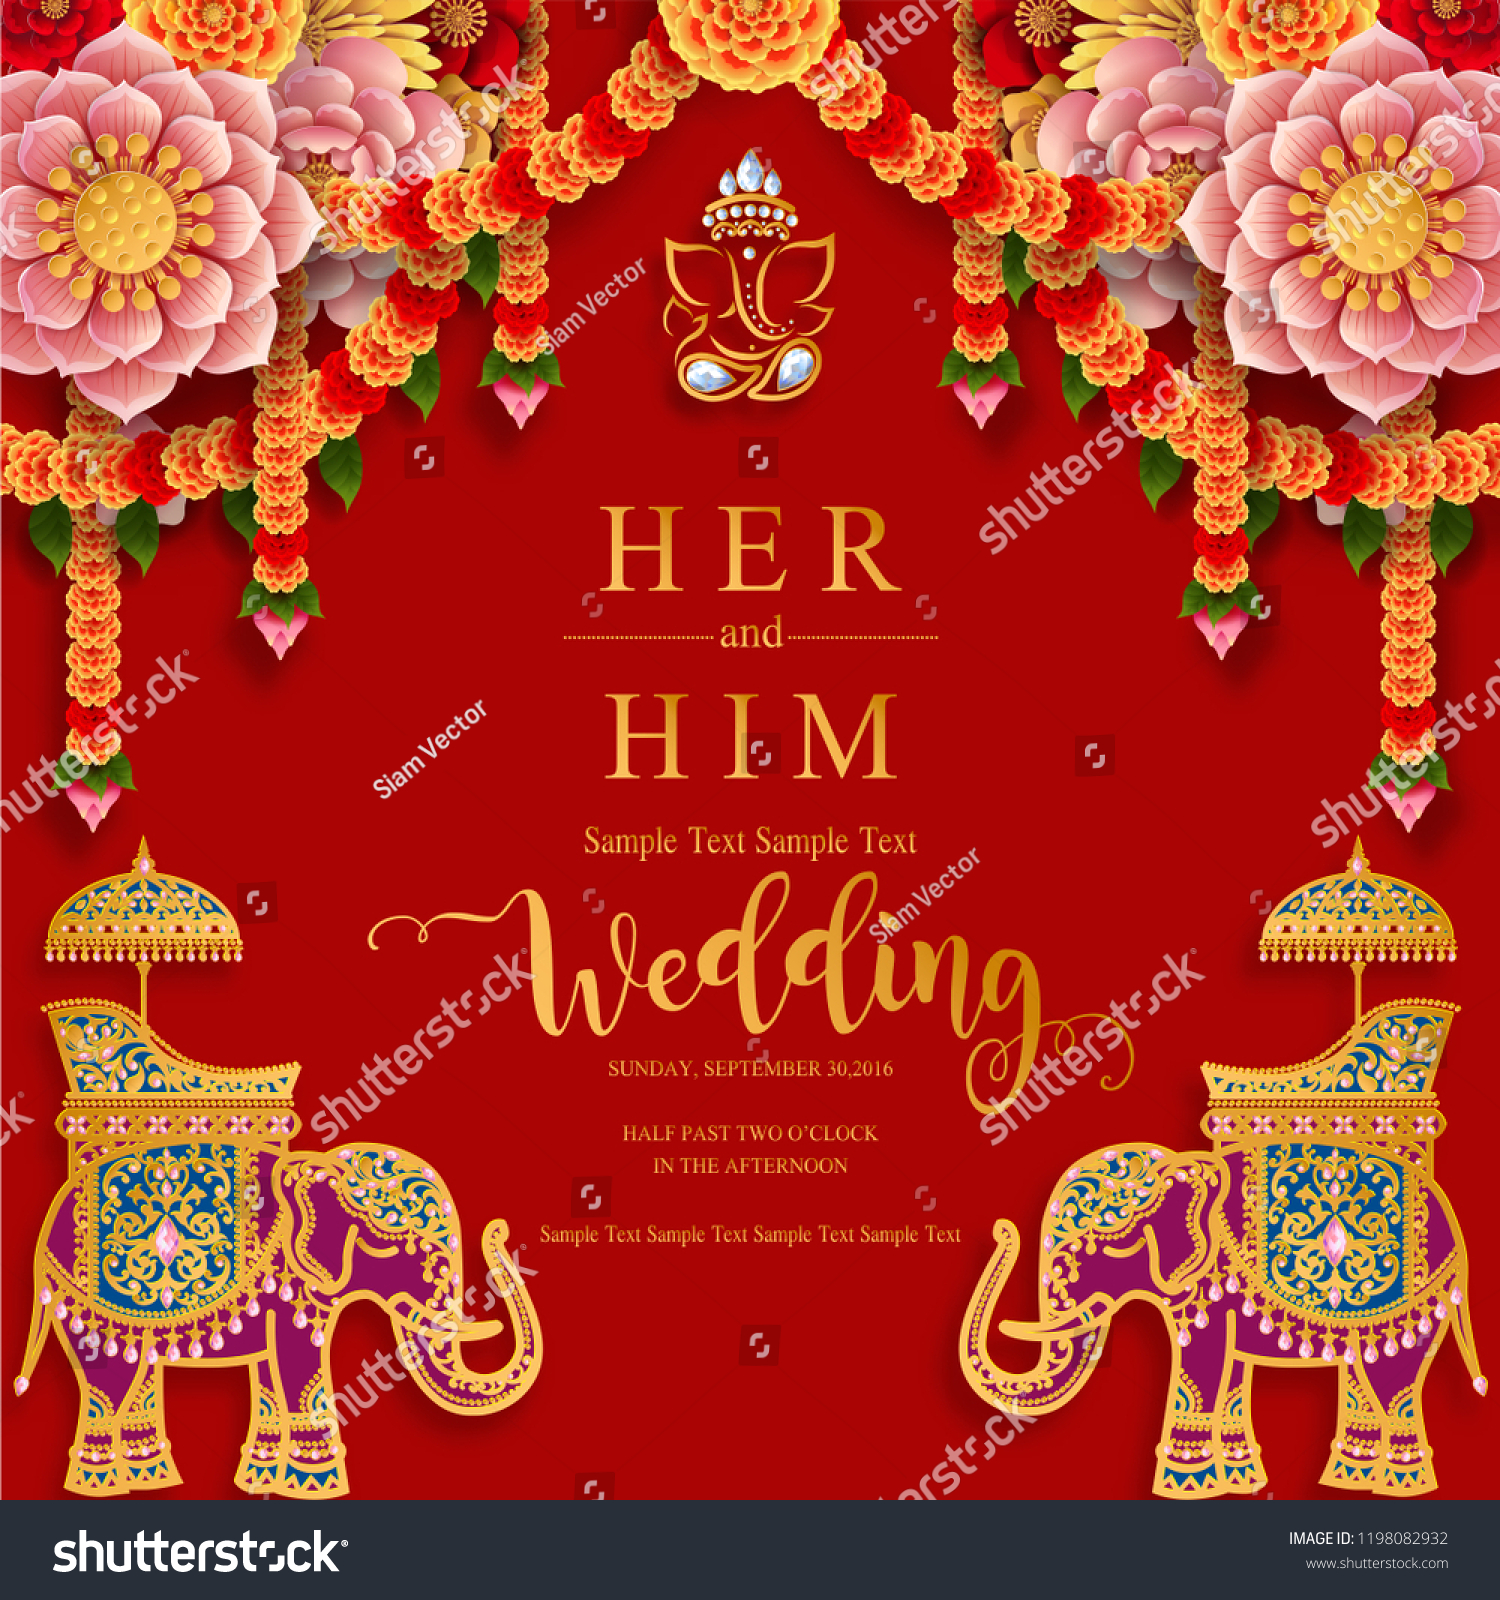 https www shutterstock com image vector wedding invitation card templates gold patterned 1198082932